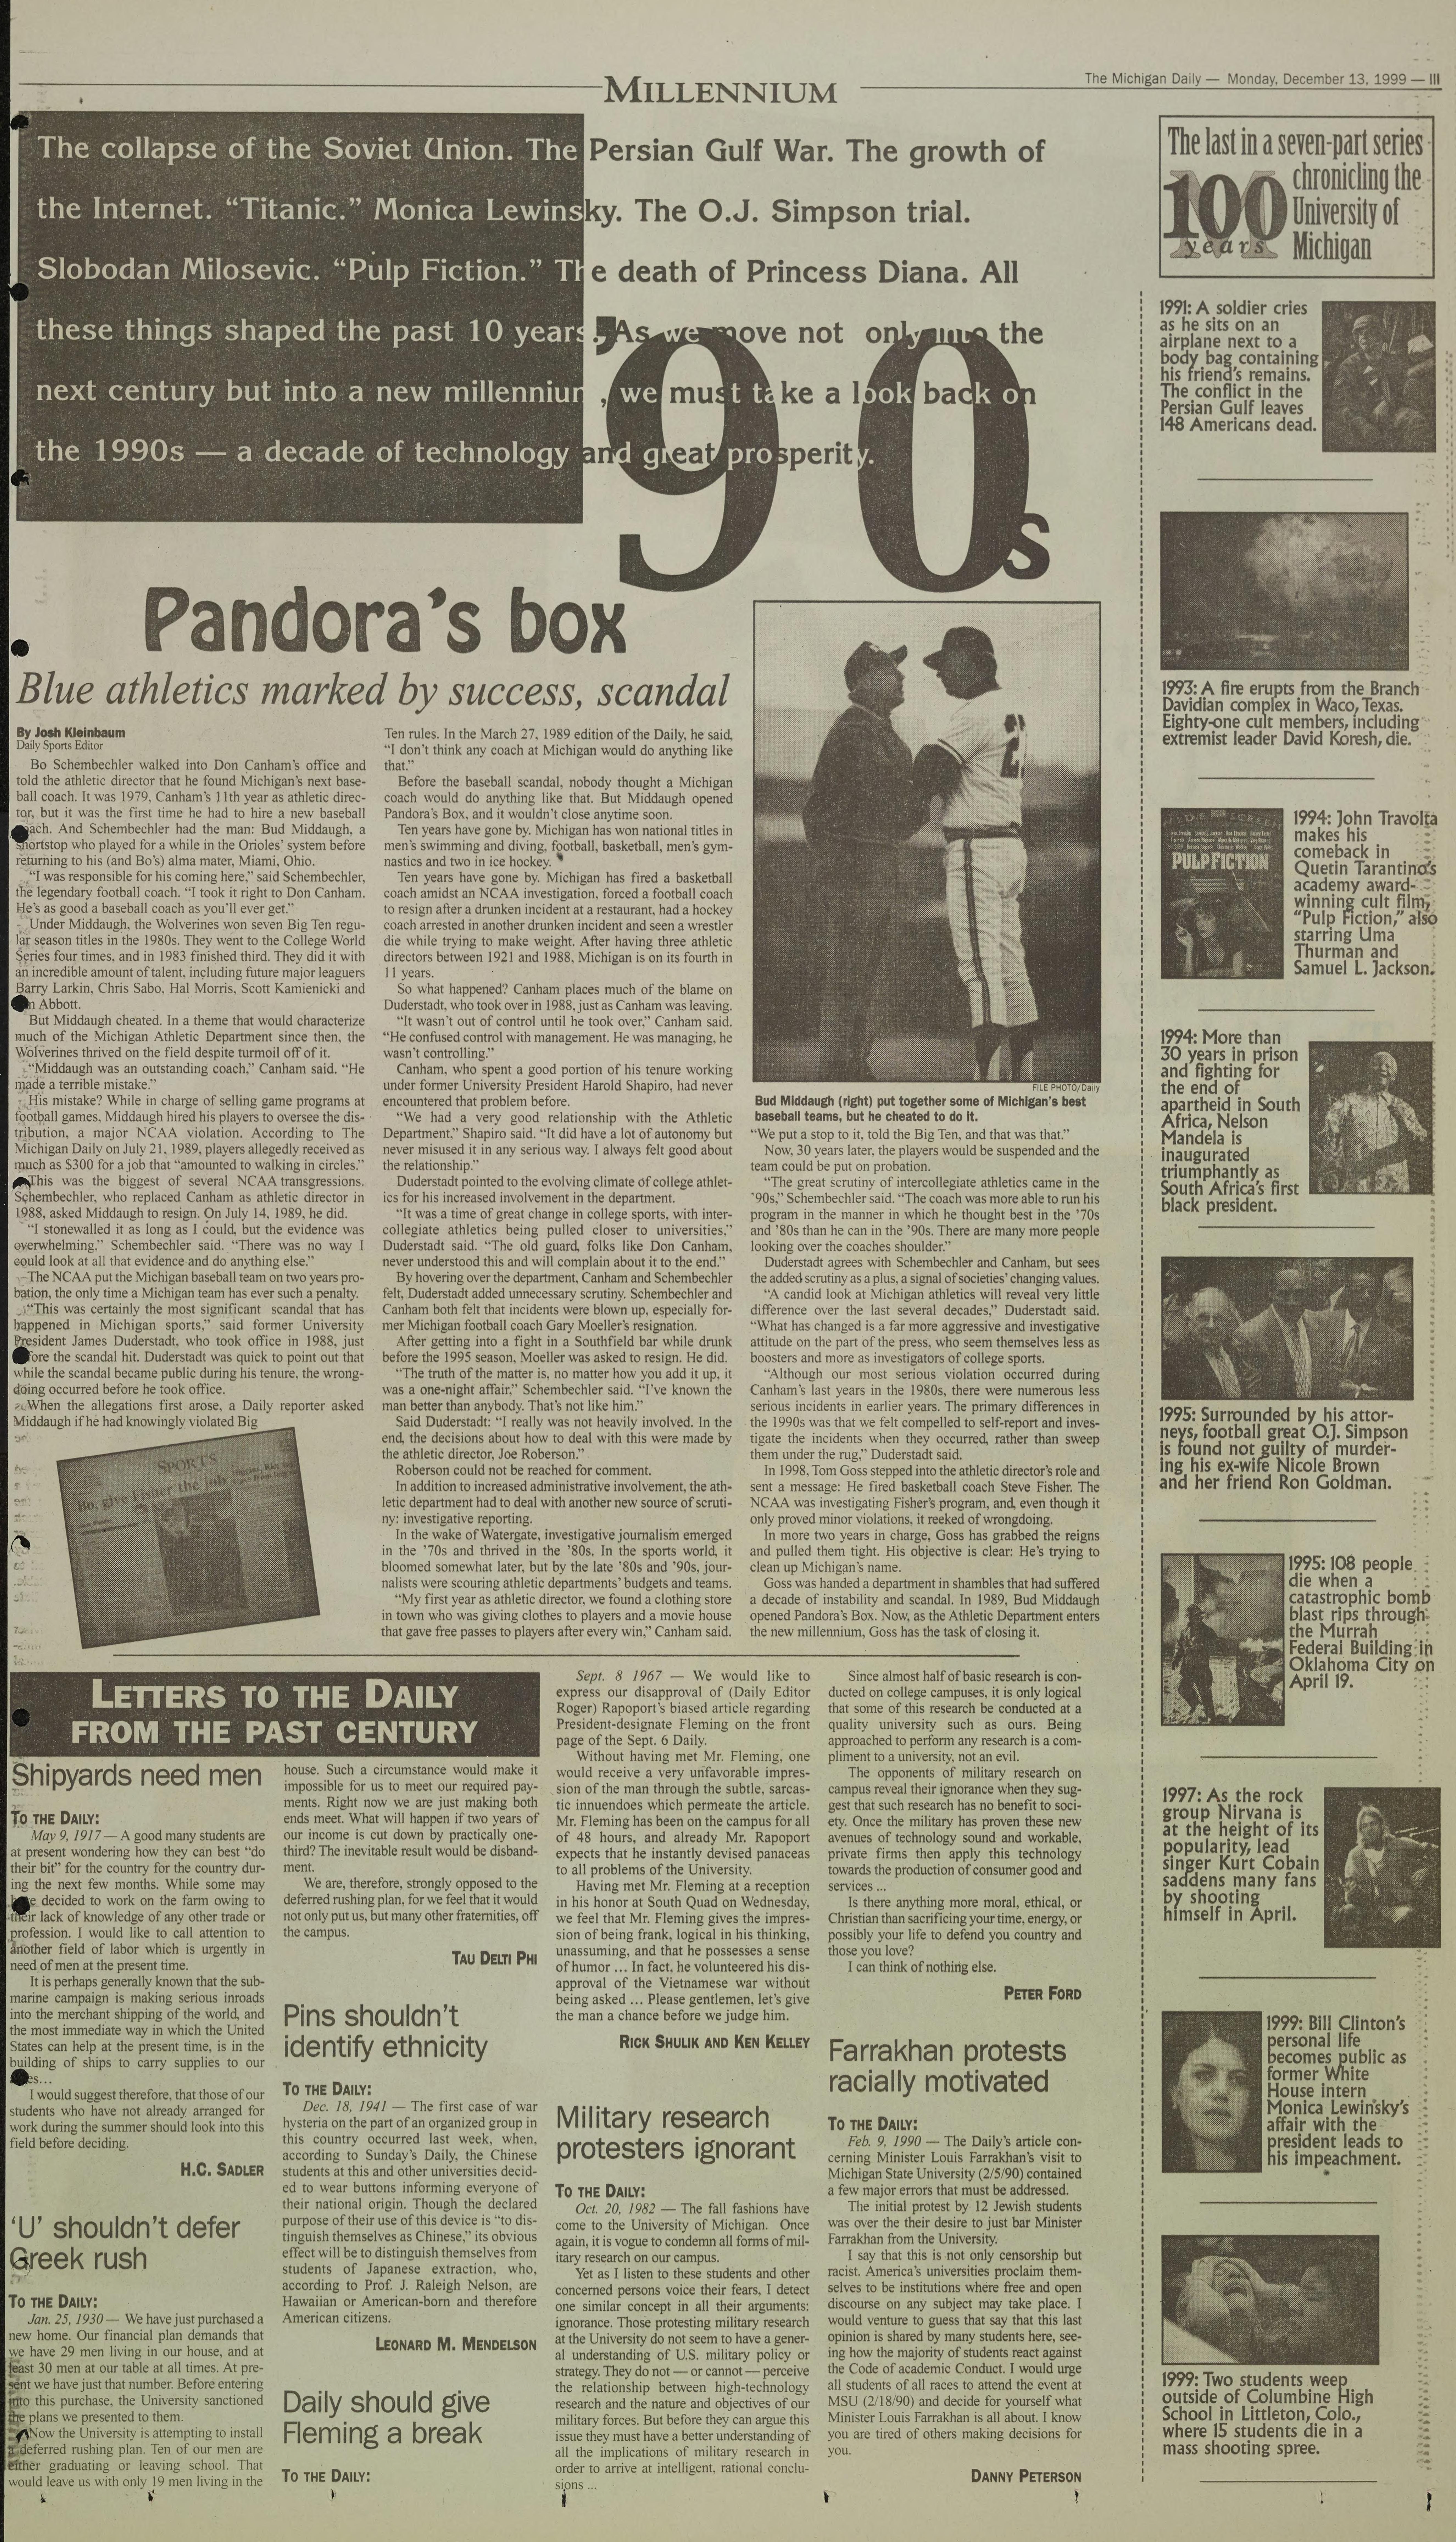 Michigan Daily Digital Archives - December 13, 1999 (vol